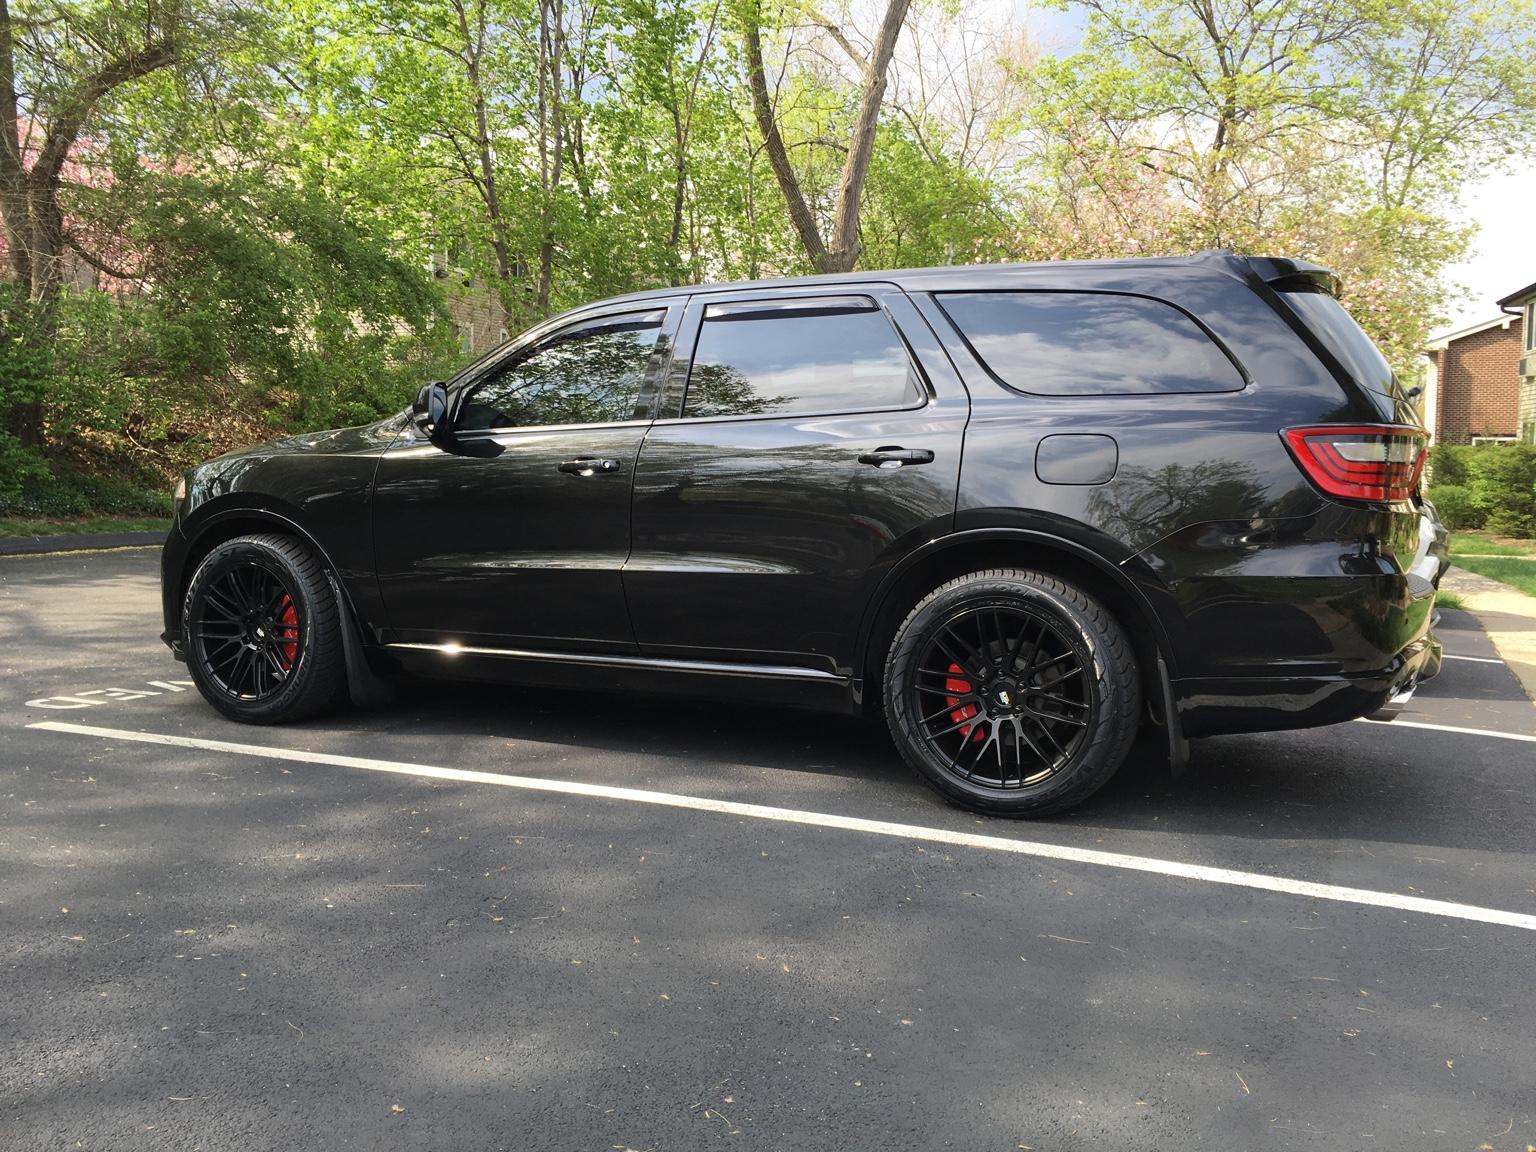 Dodge Durango With Black Rims >> show me your custom rims - Page 5